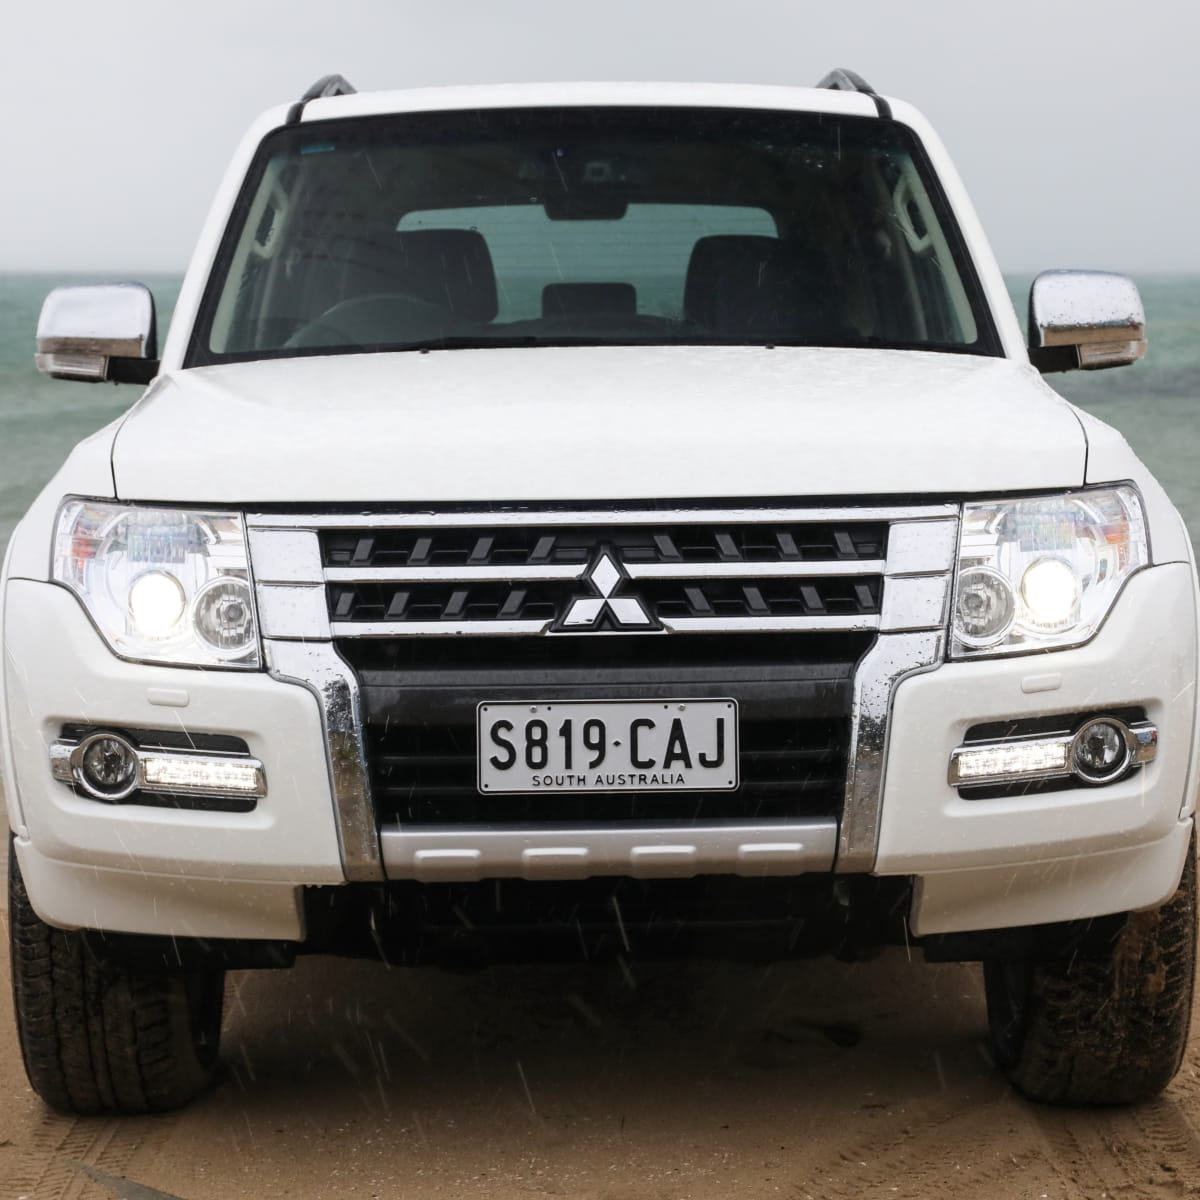 2020 Mitsubishi Pajero GLS review | CarAdvice